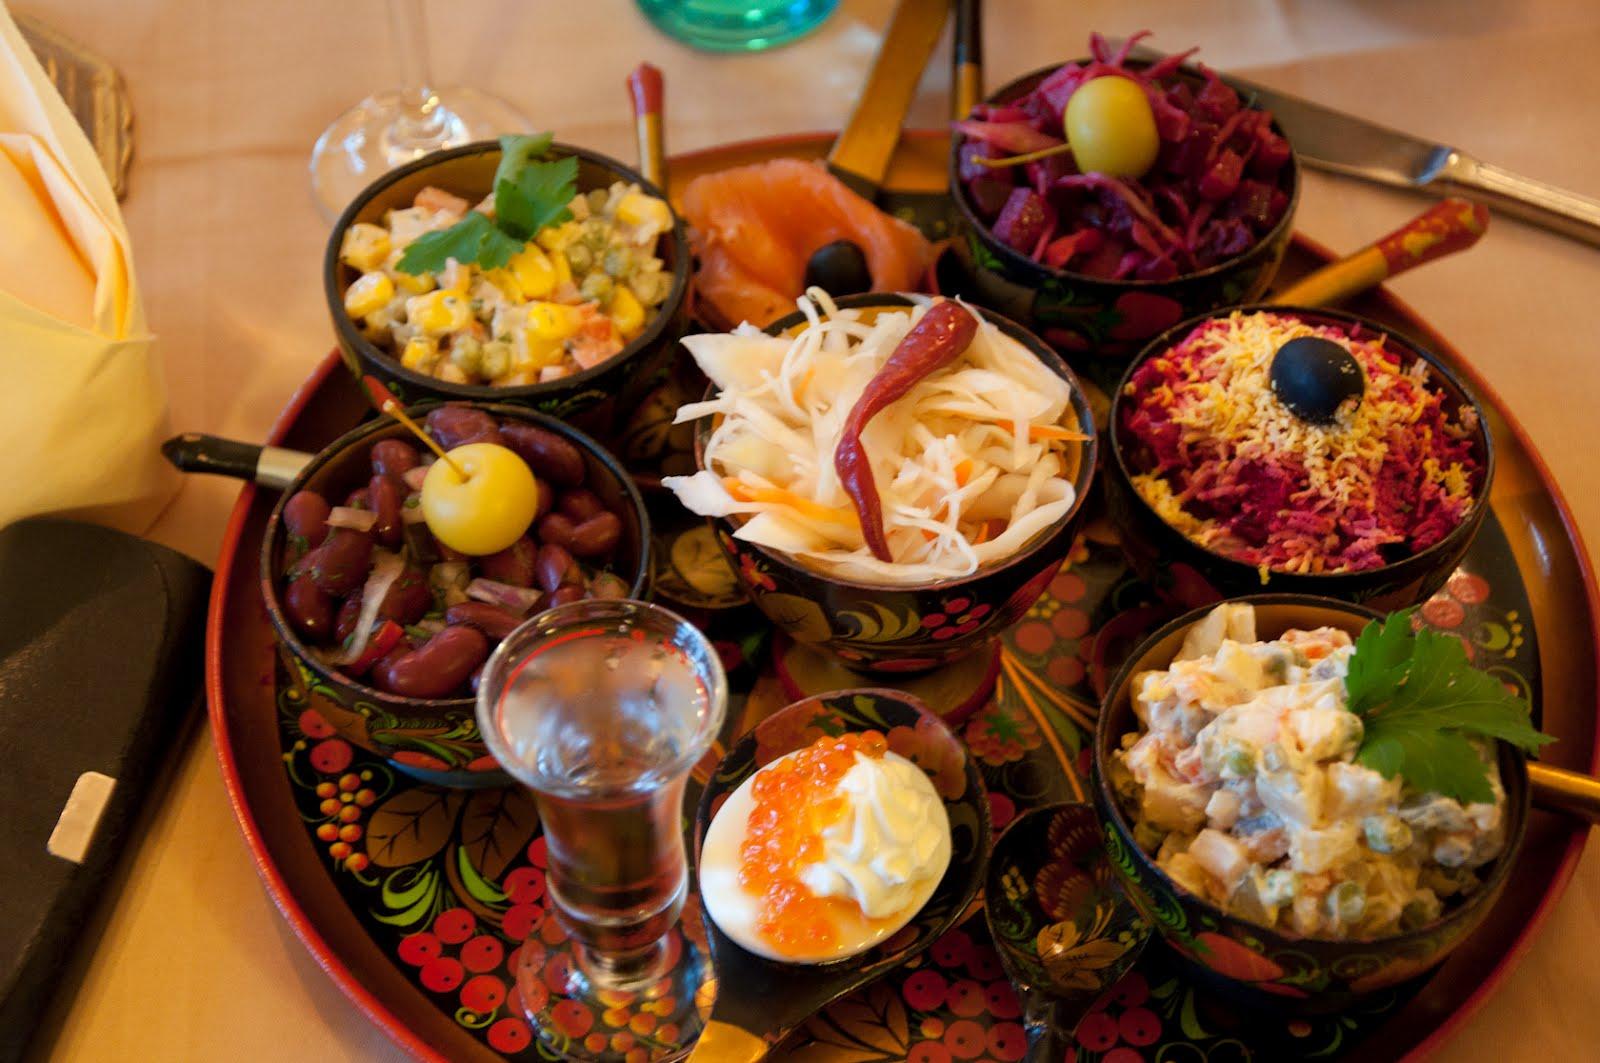 Russian Gastronomy Week in Cyprus